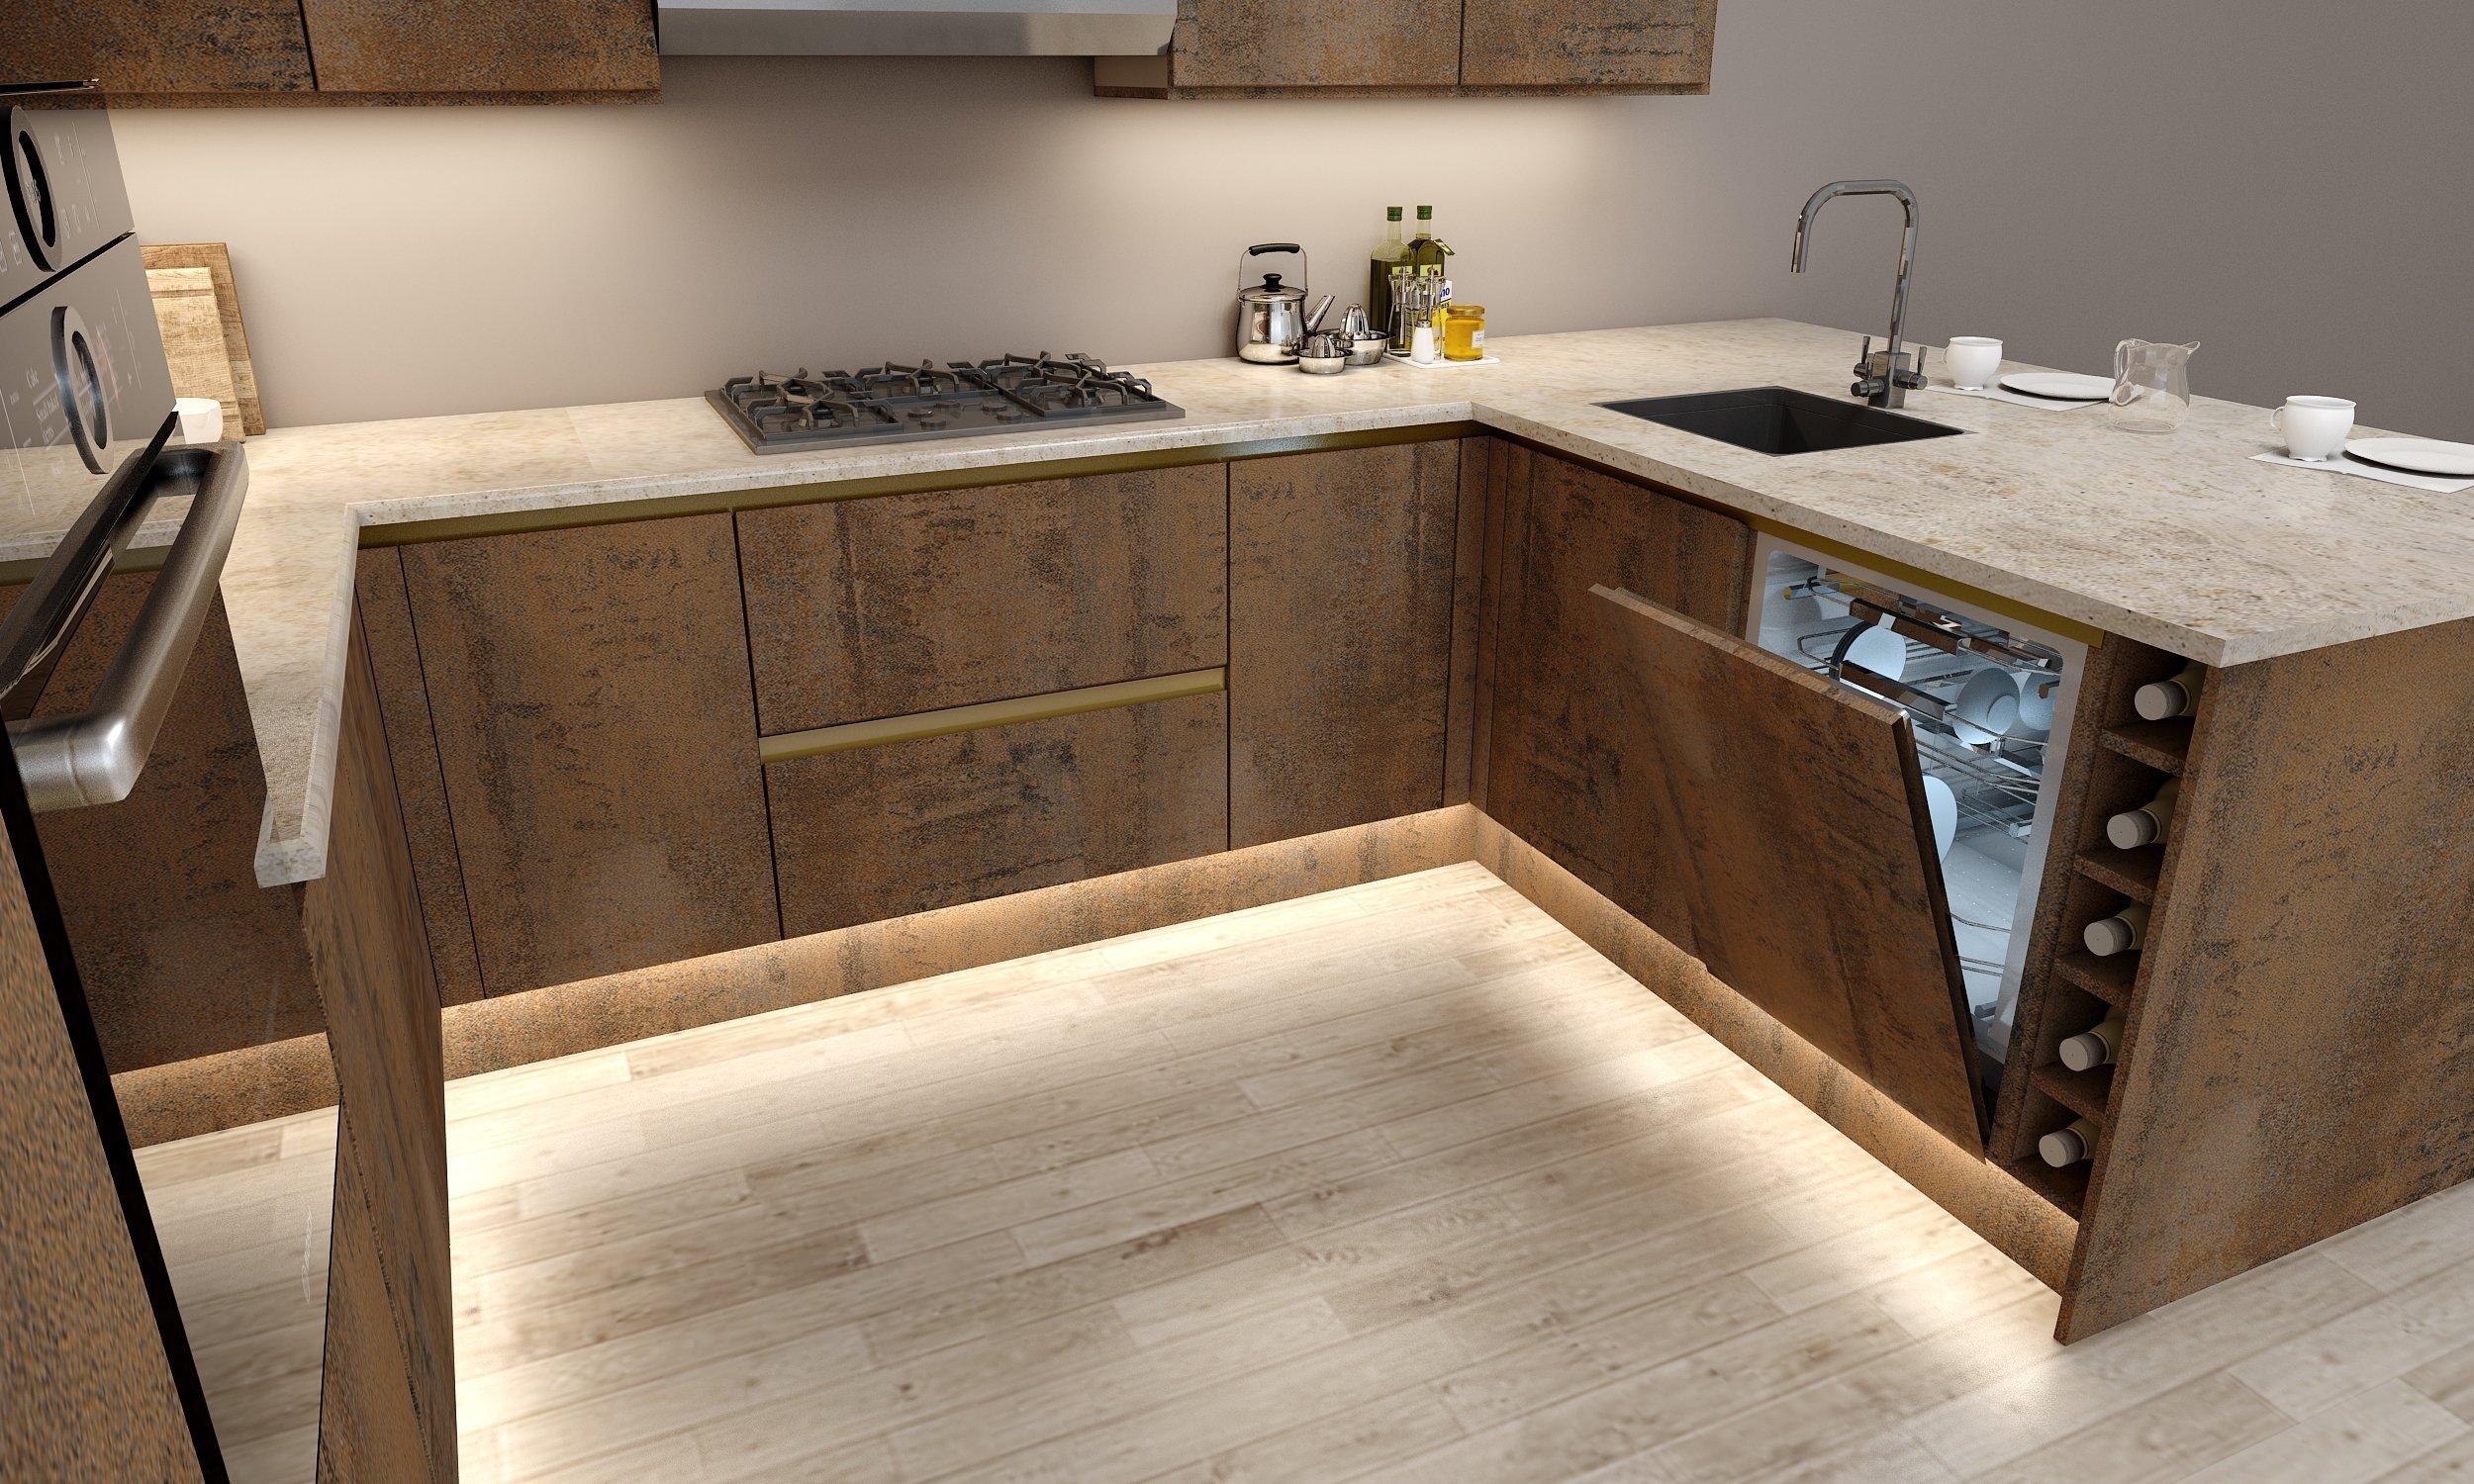 G Shape Handleless Quartz Kitchen in Oxide Finish With Gold Handleless Profile